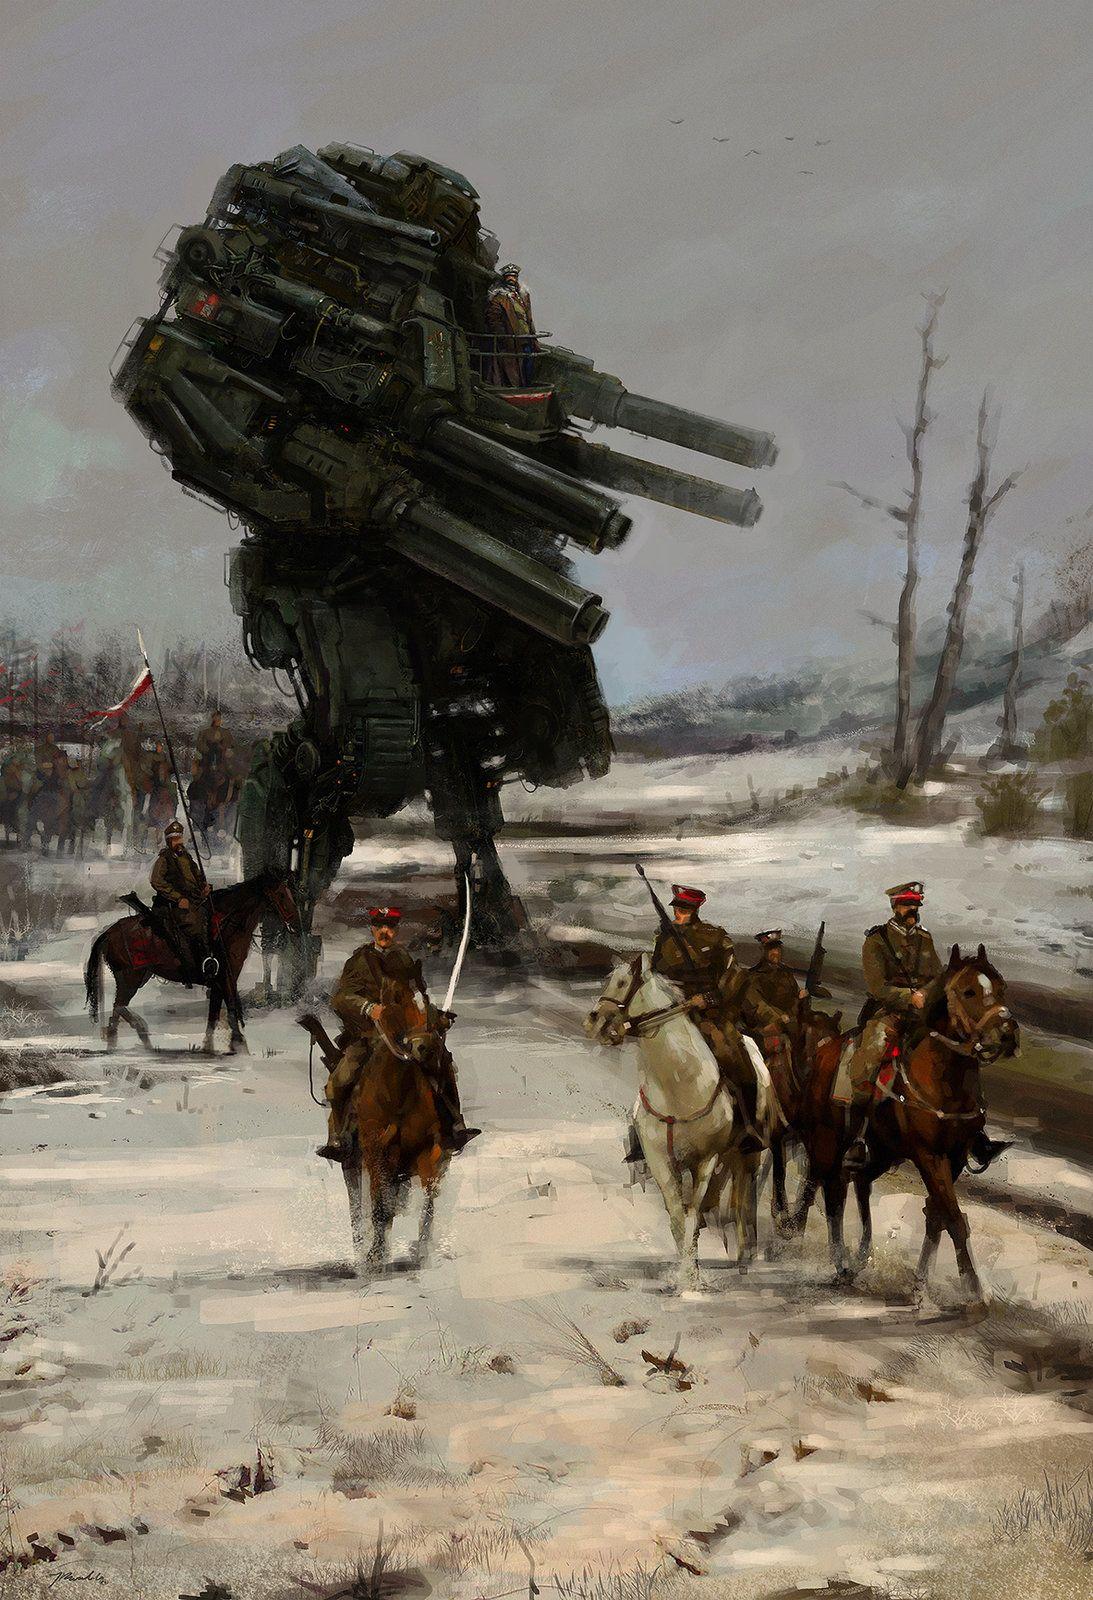 1920 - Warlord, Jakub Rozalski on ArtStation at https://www.artstation.com/artwork/1920-warlord